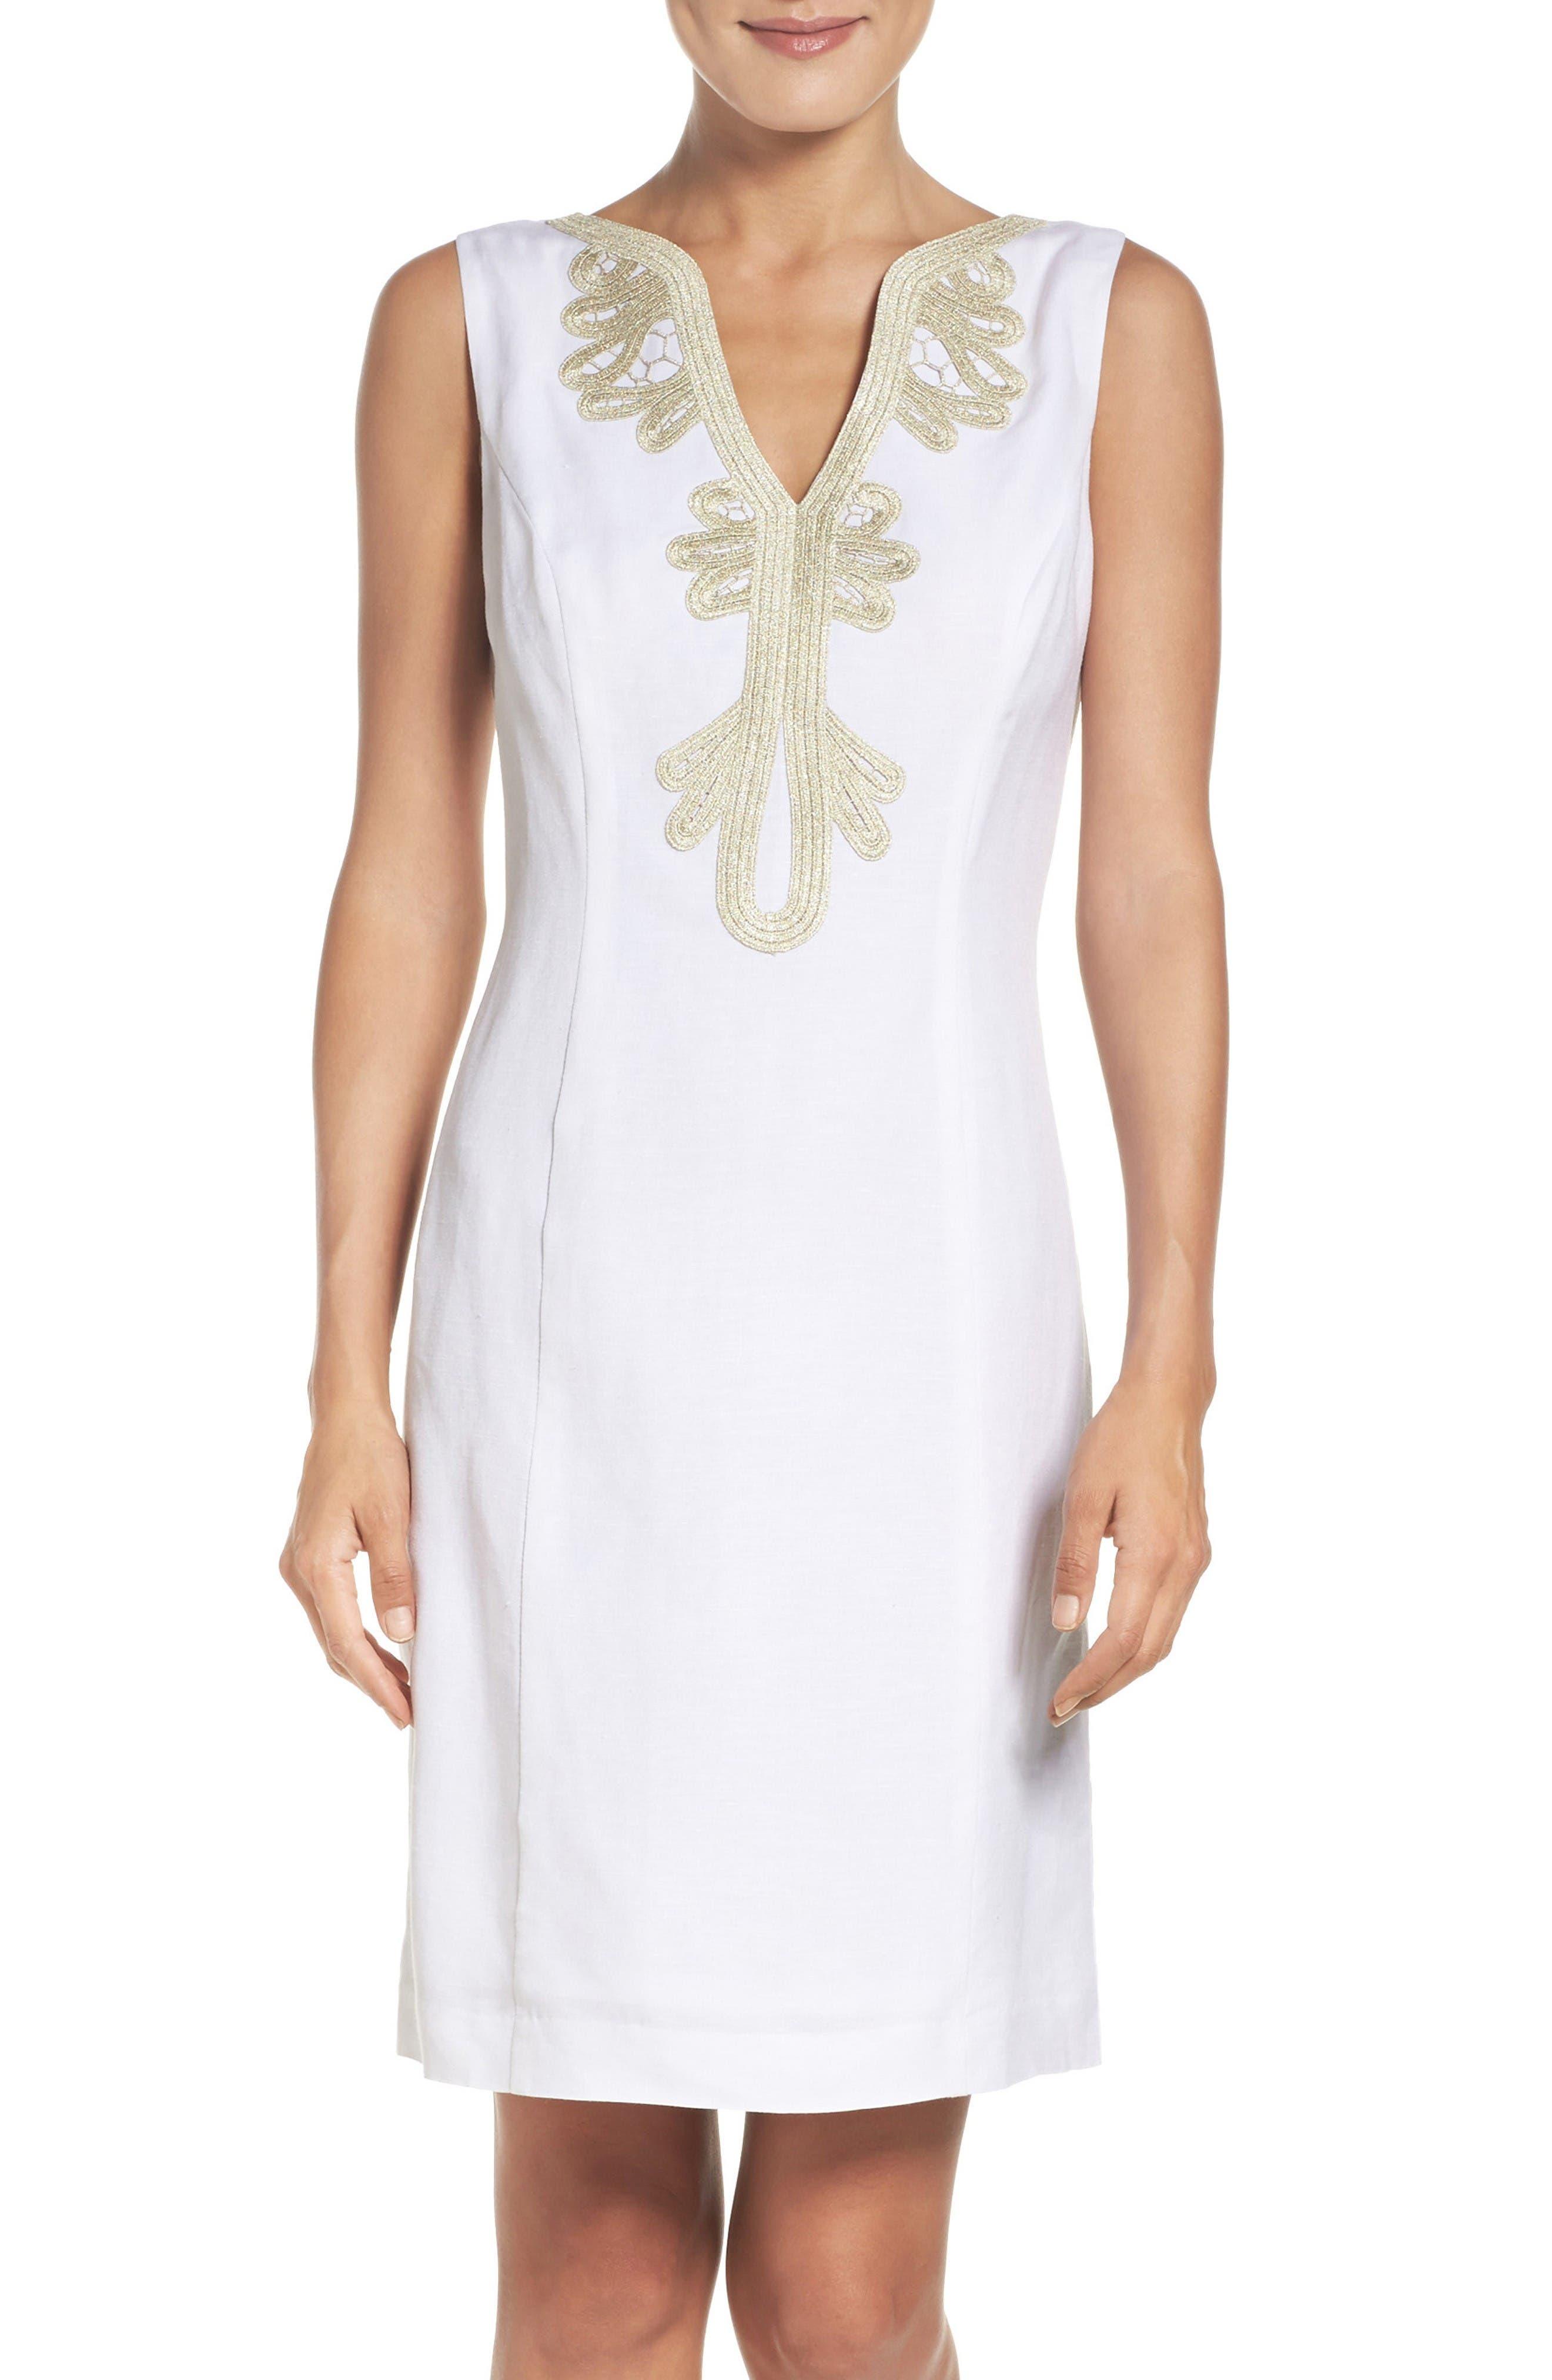 Alternate Image 1 Selected - Eliza J Embroidered Neck Sheath Dress